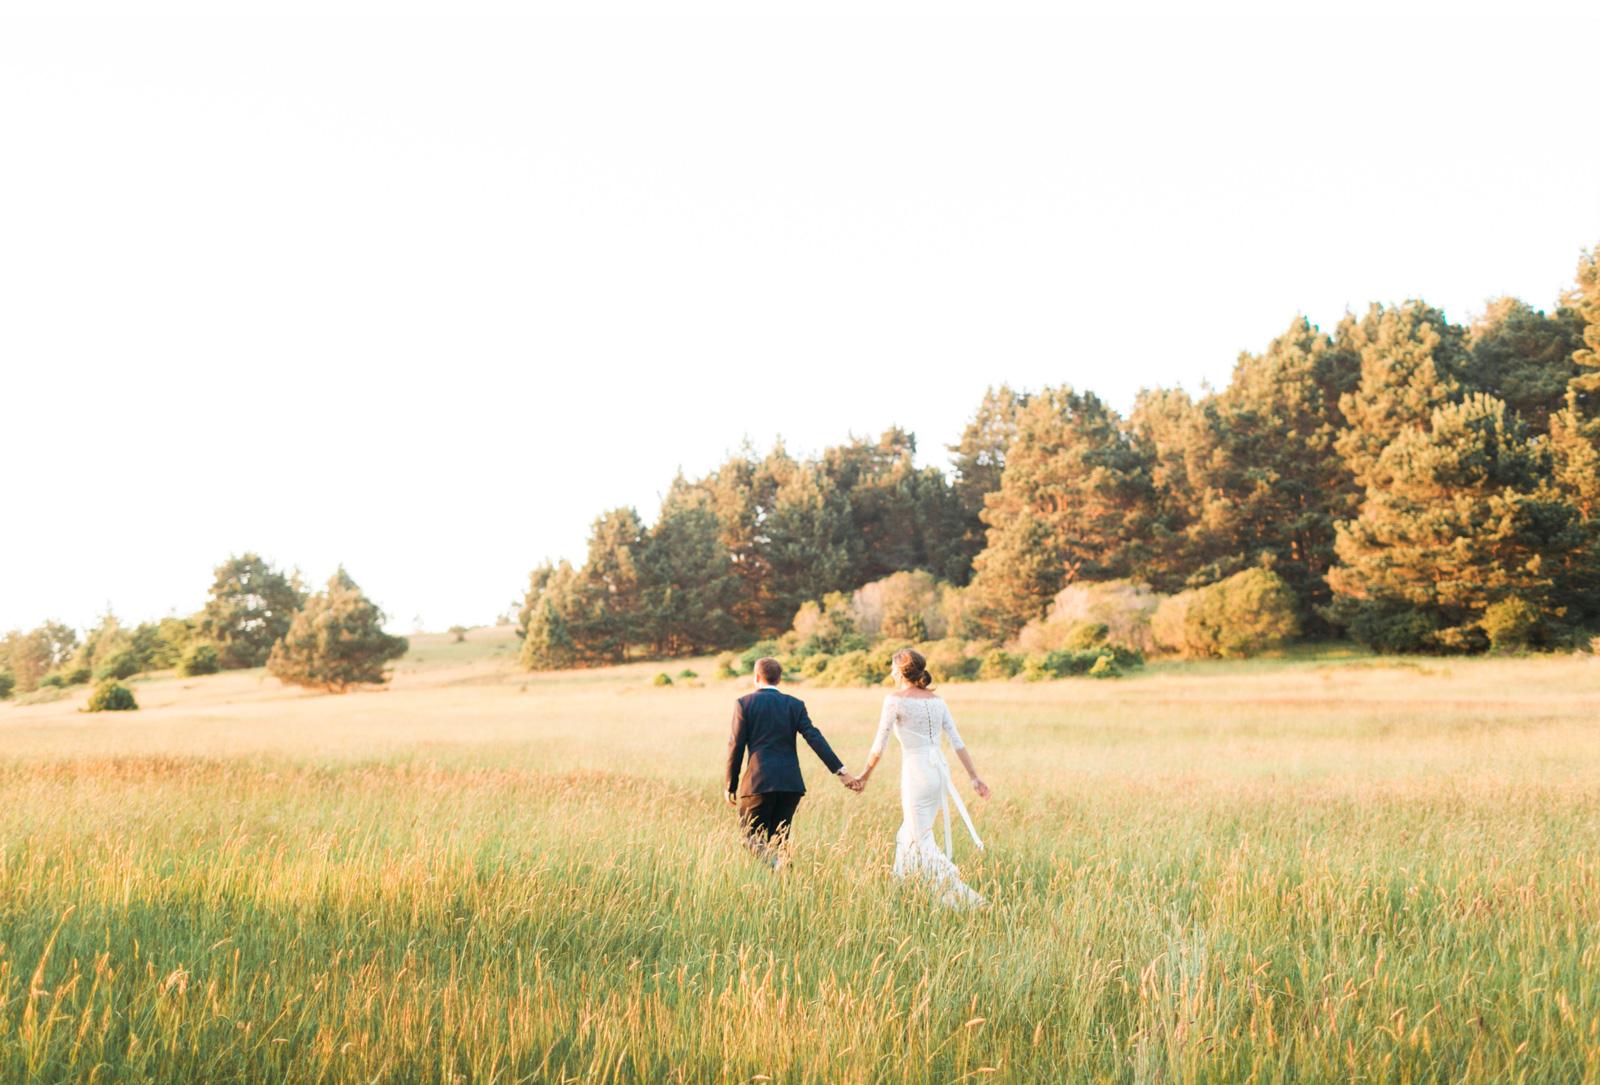 Natalie-Schutt-Photography-Adventure-Wedding-Mendocino_06.jpg